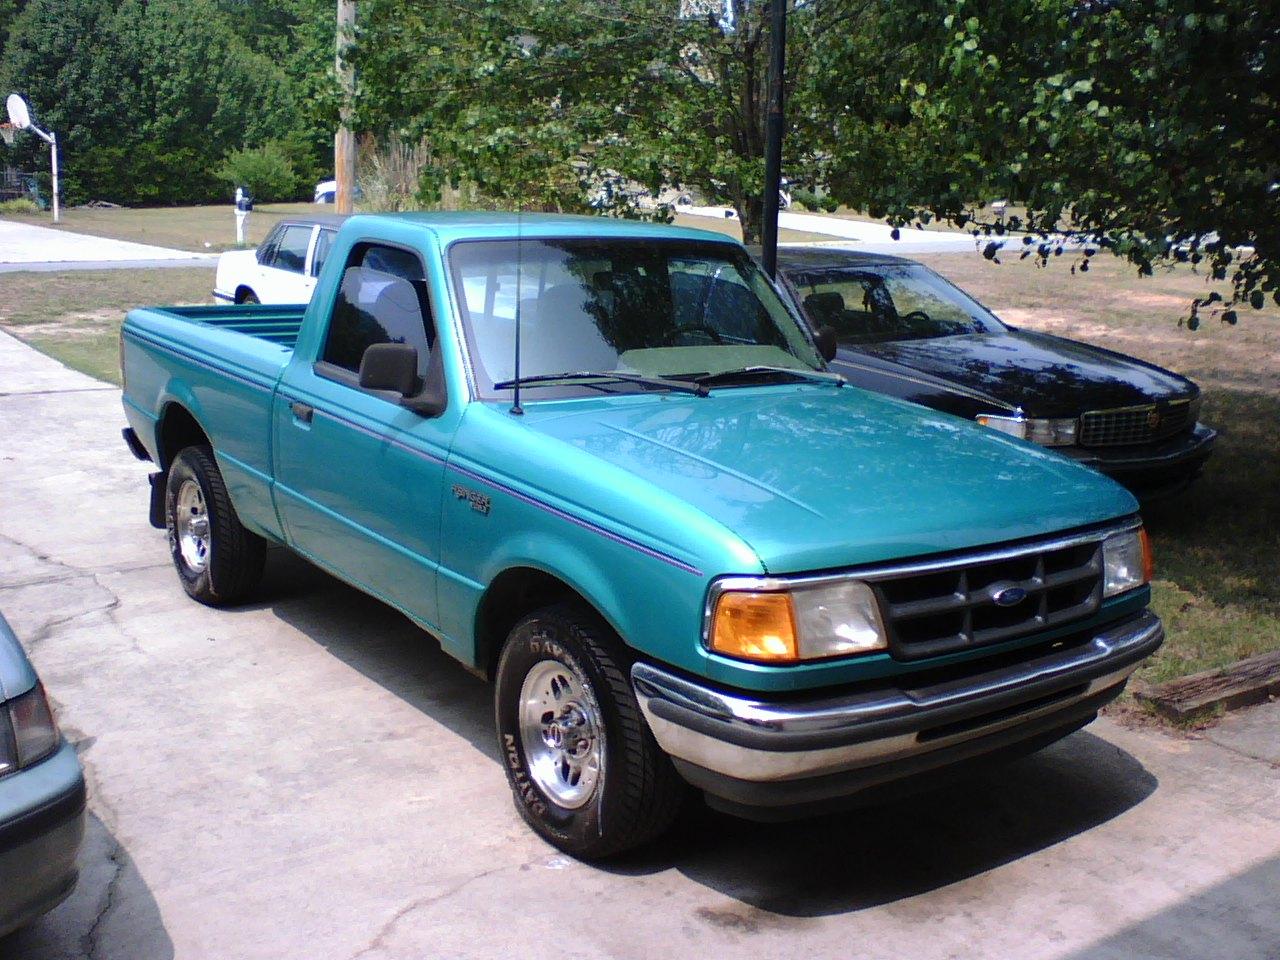 2011 Ford Ranger Xl Pickup Power Steering Fuel Capacity 195 Gal